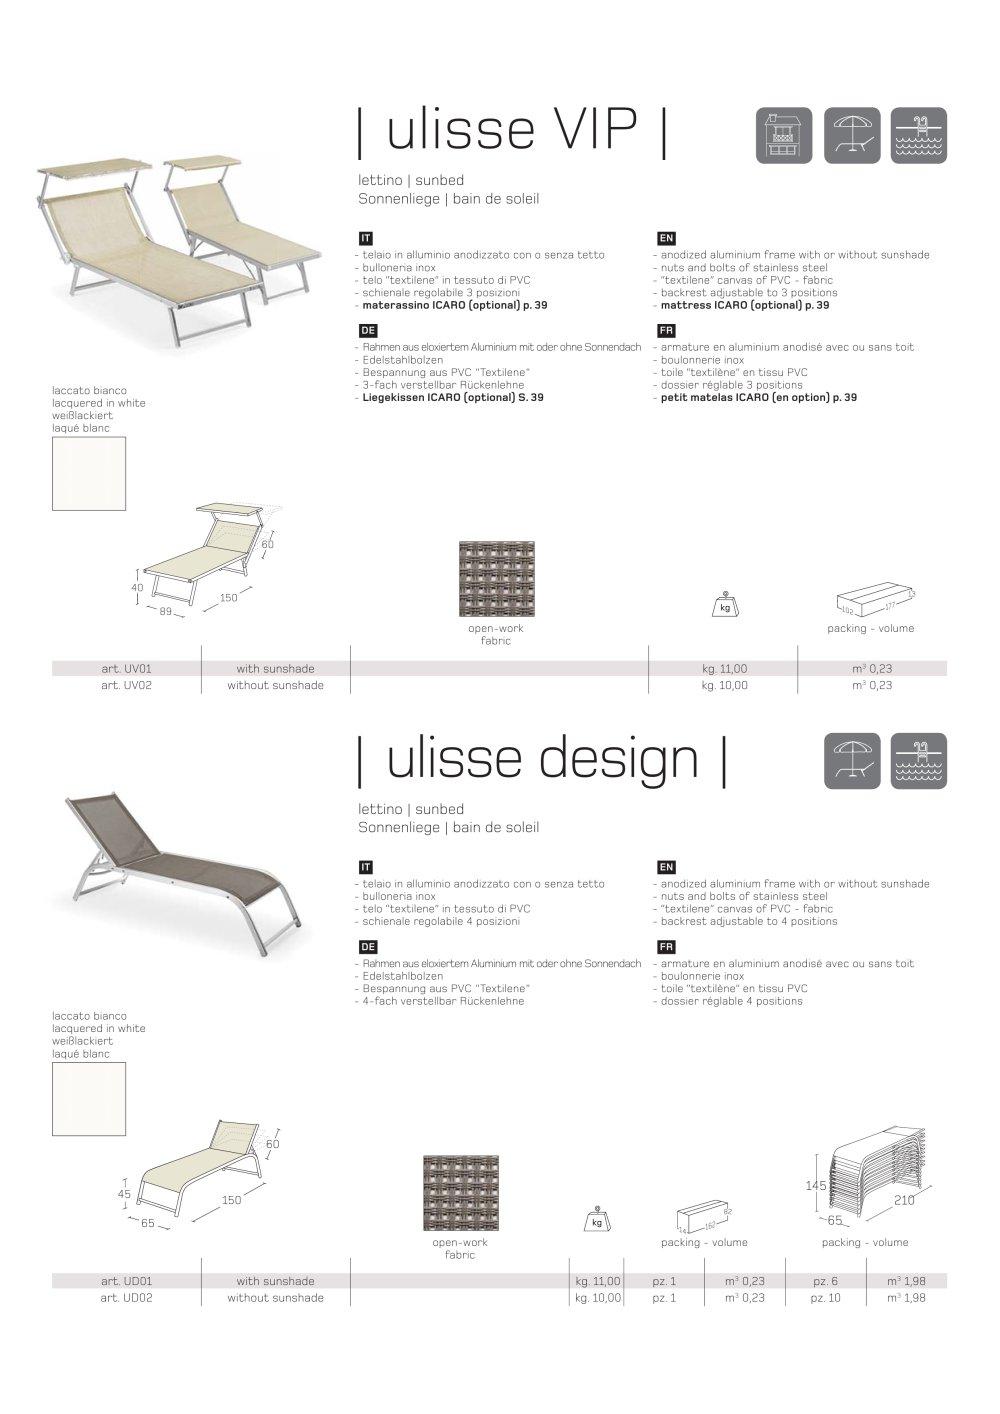 Ulisse VIP - Ulisse Design Technisches Arbeitsblatt - Ombrellificio ...